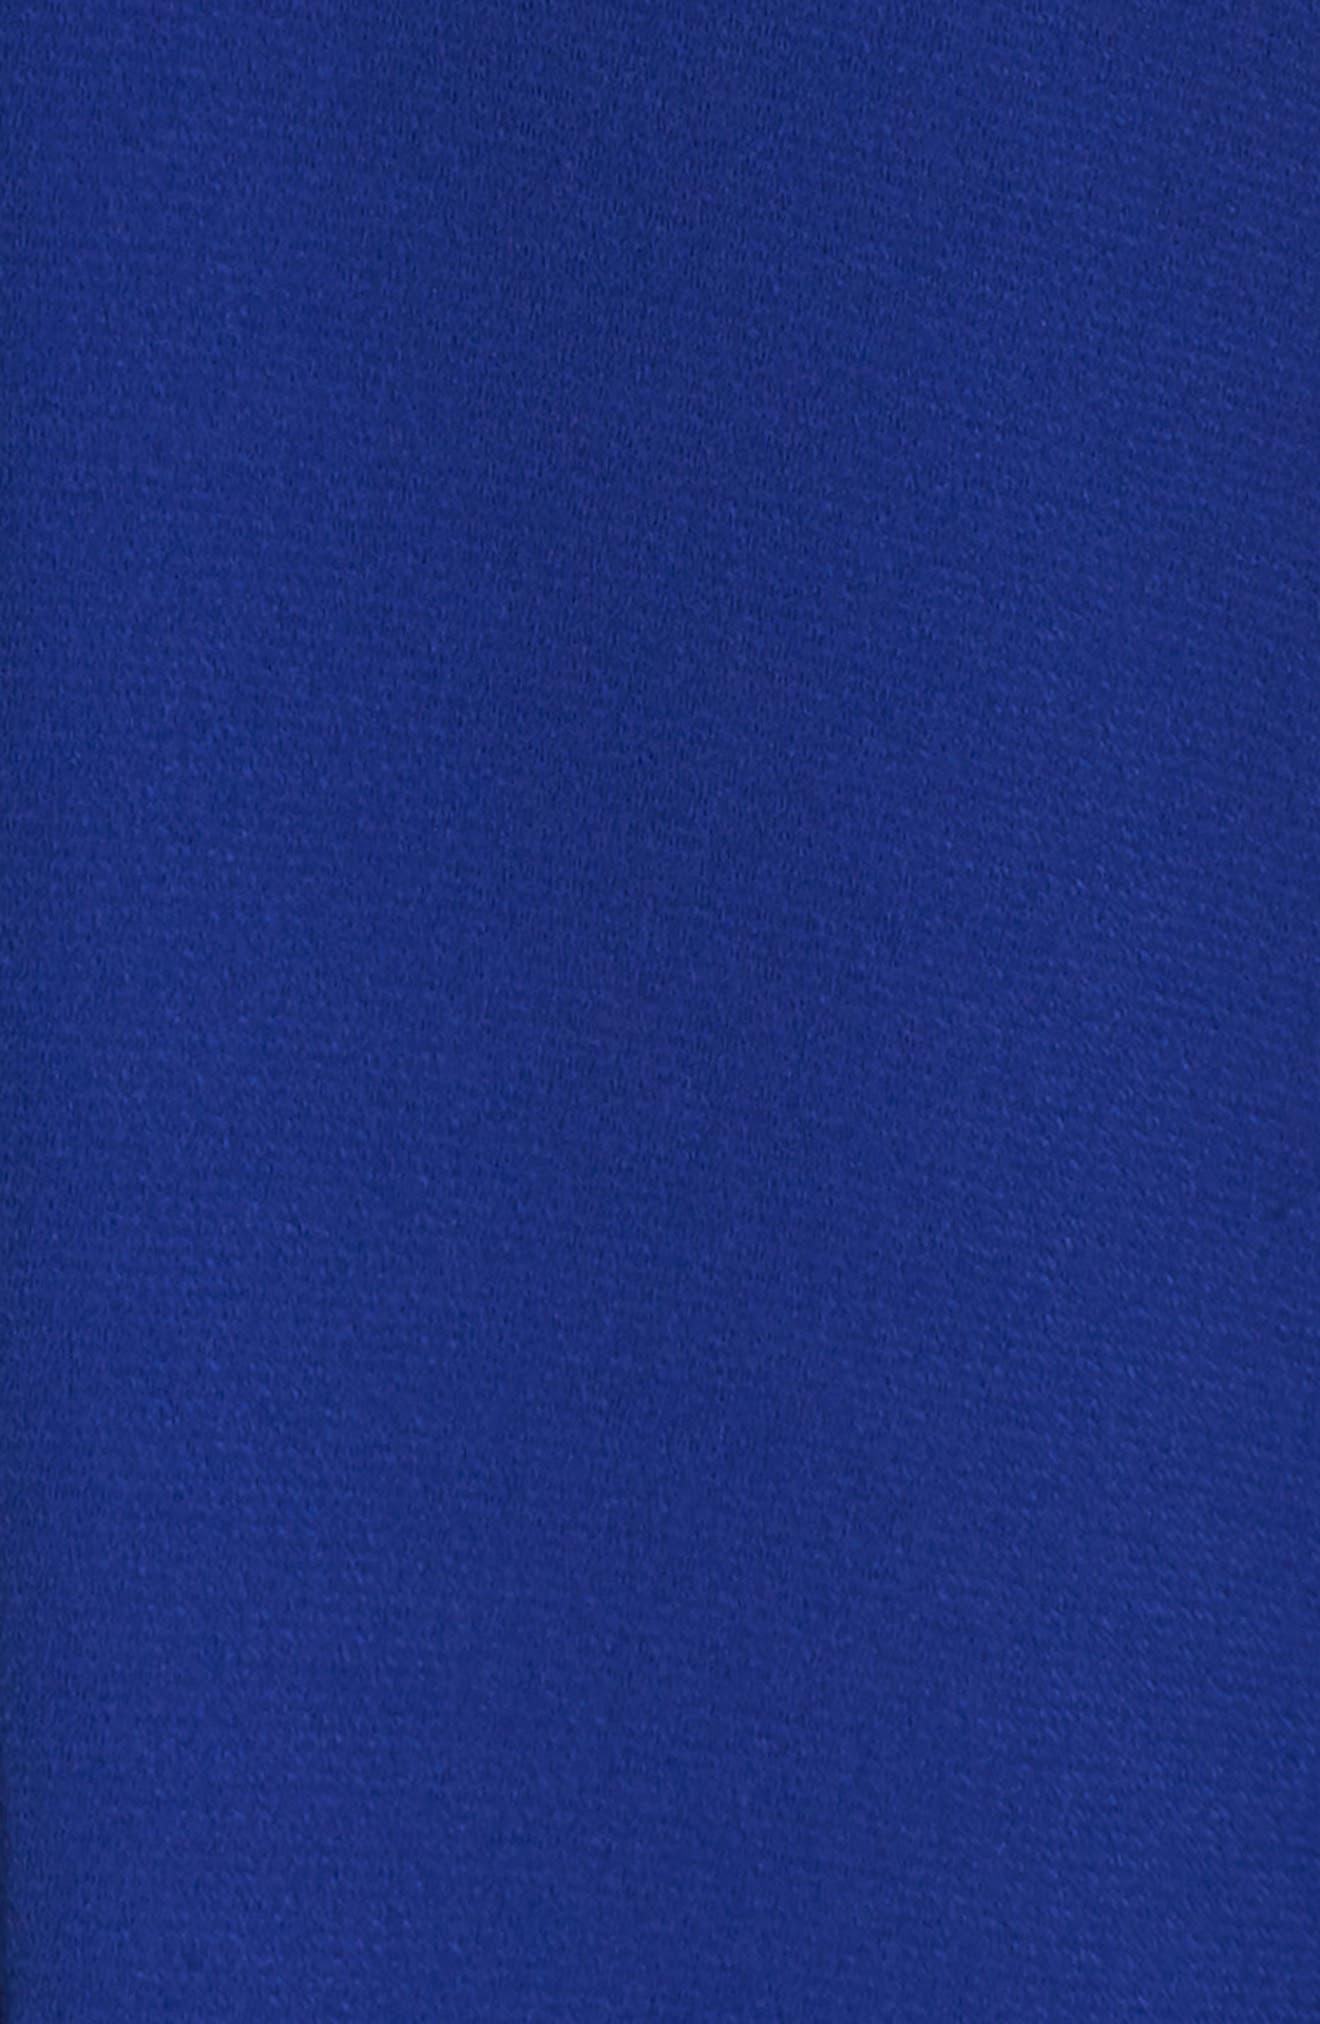 Ruched Sleeve Wide Leg Jumpsuit,                             Alternate thumbnail 6, color,                             430